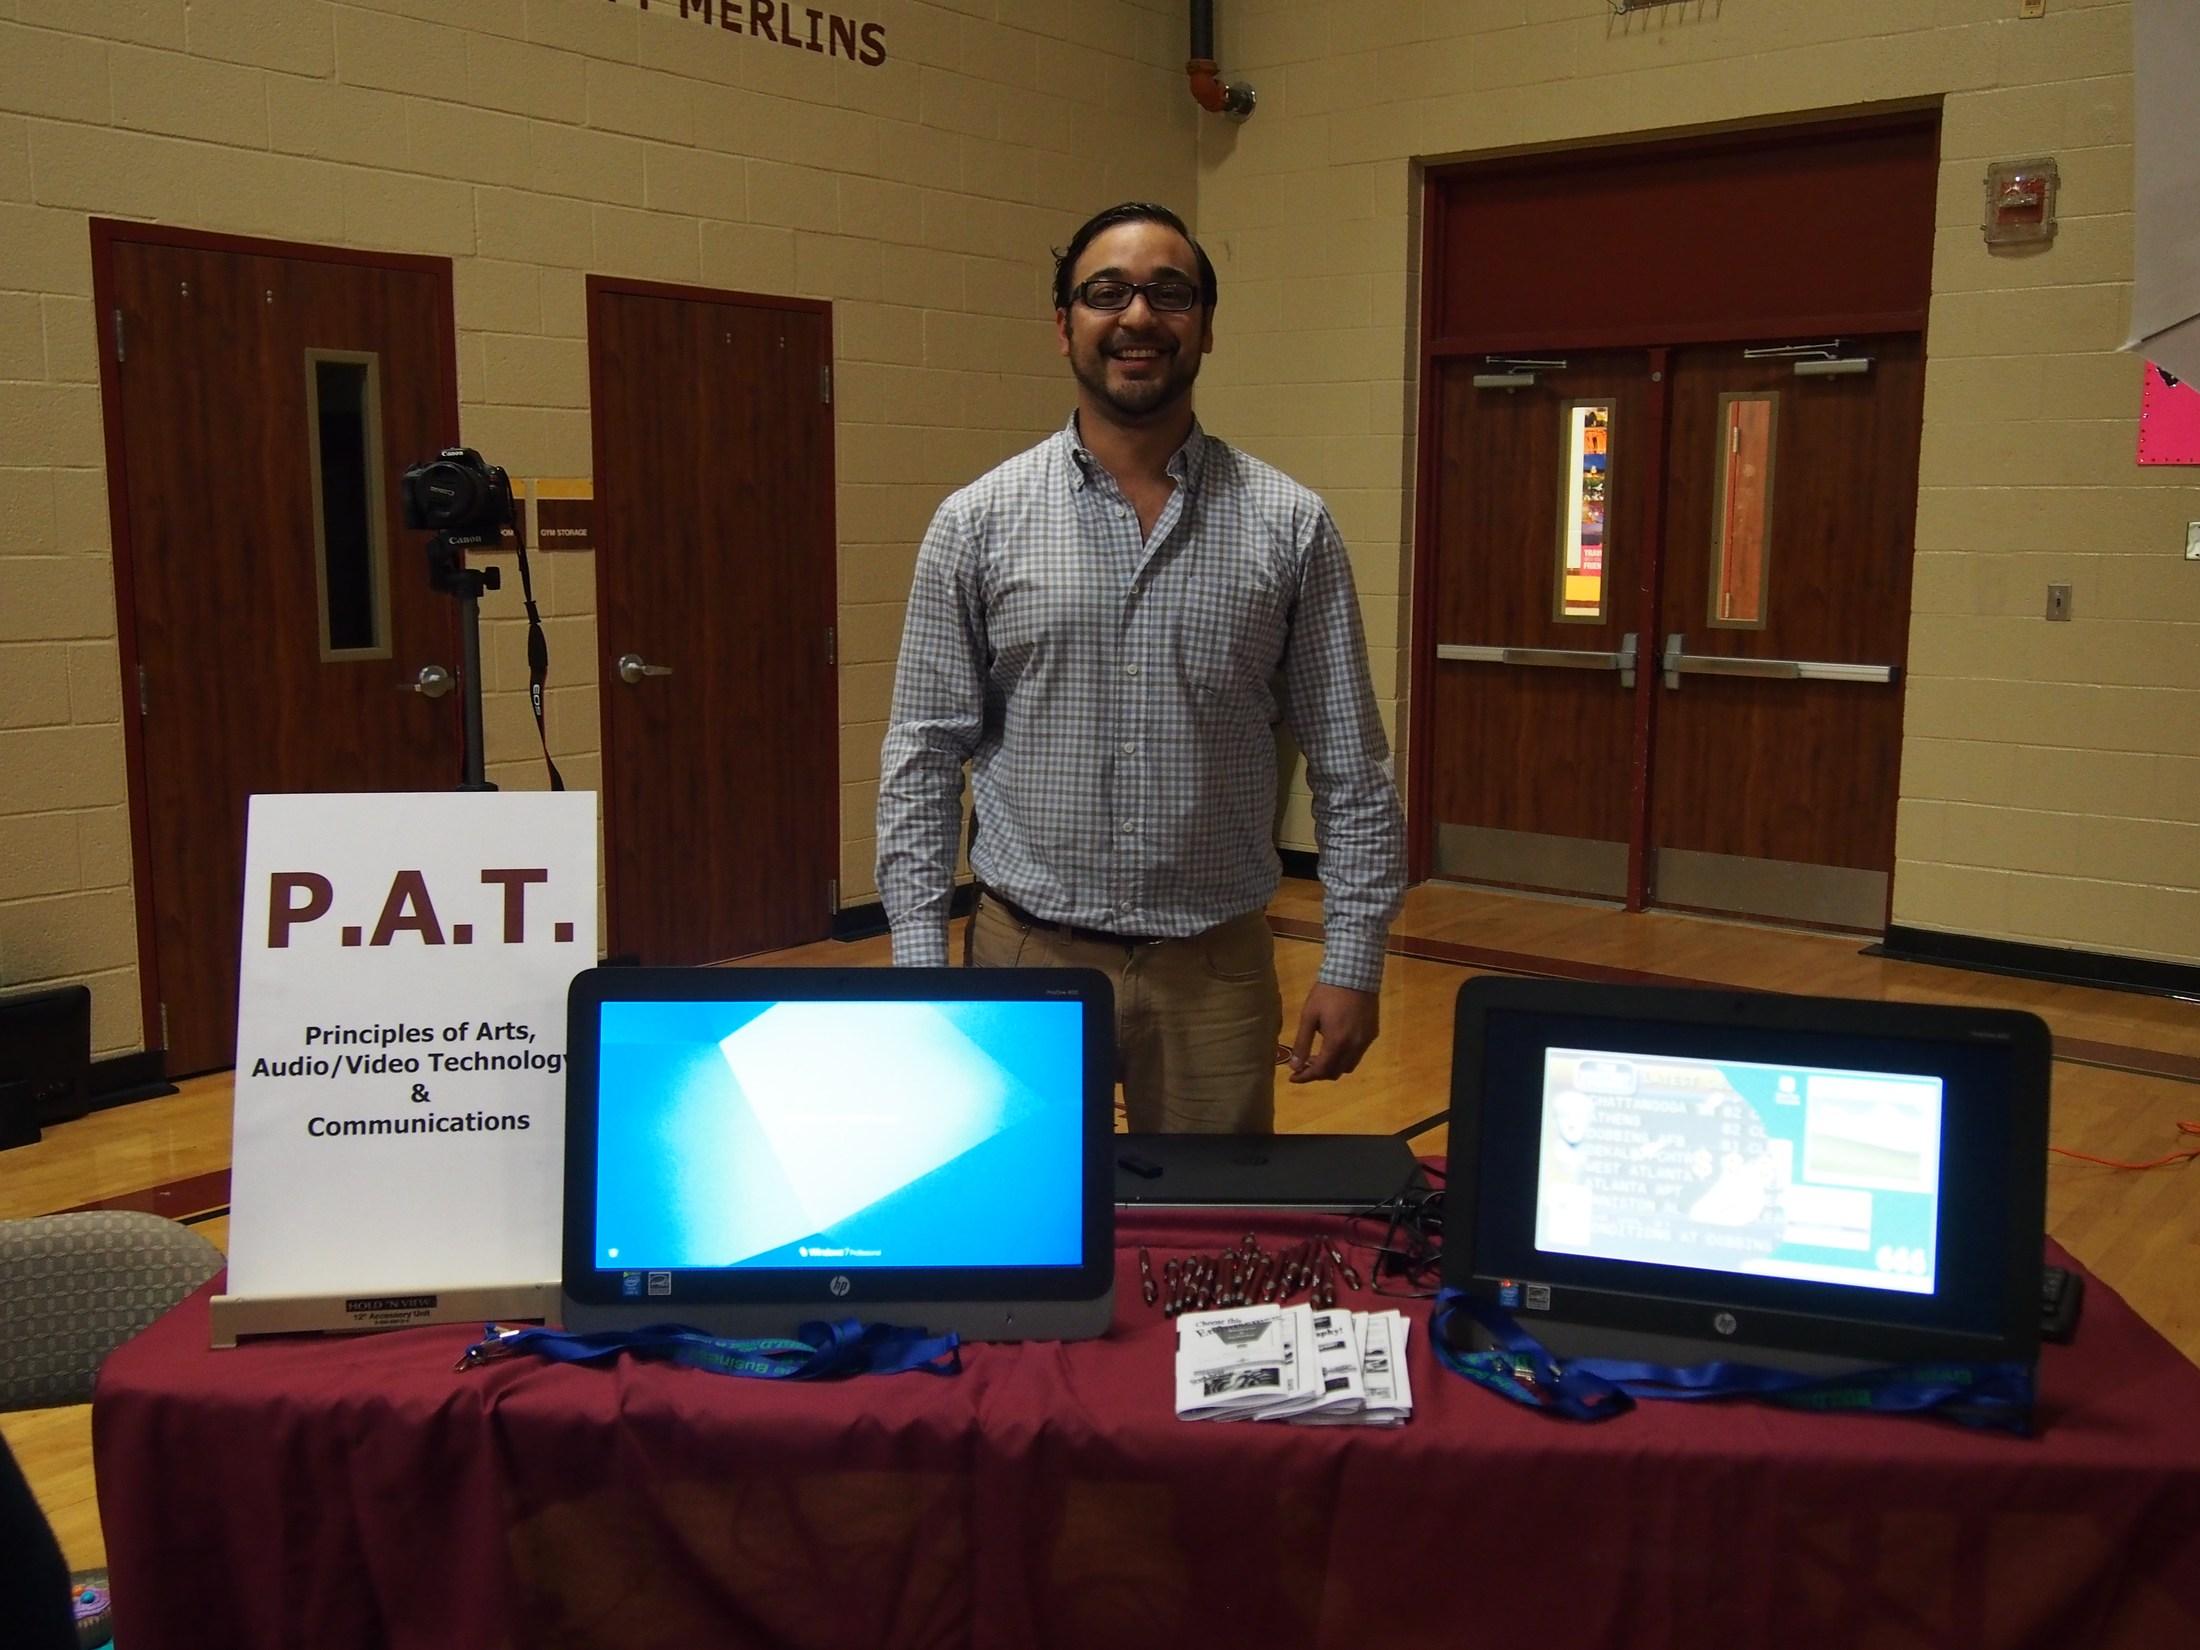 arts a v technology communications career technical education